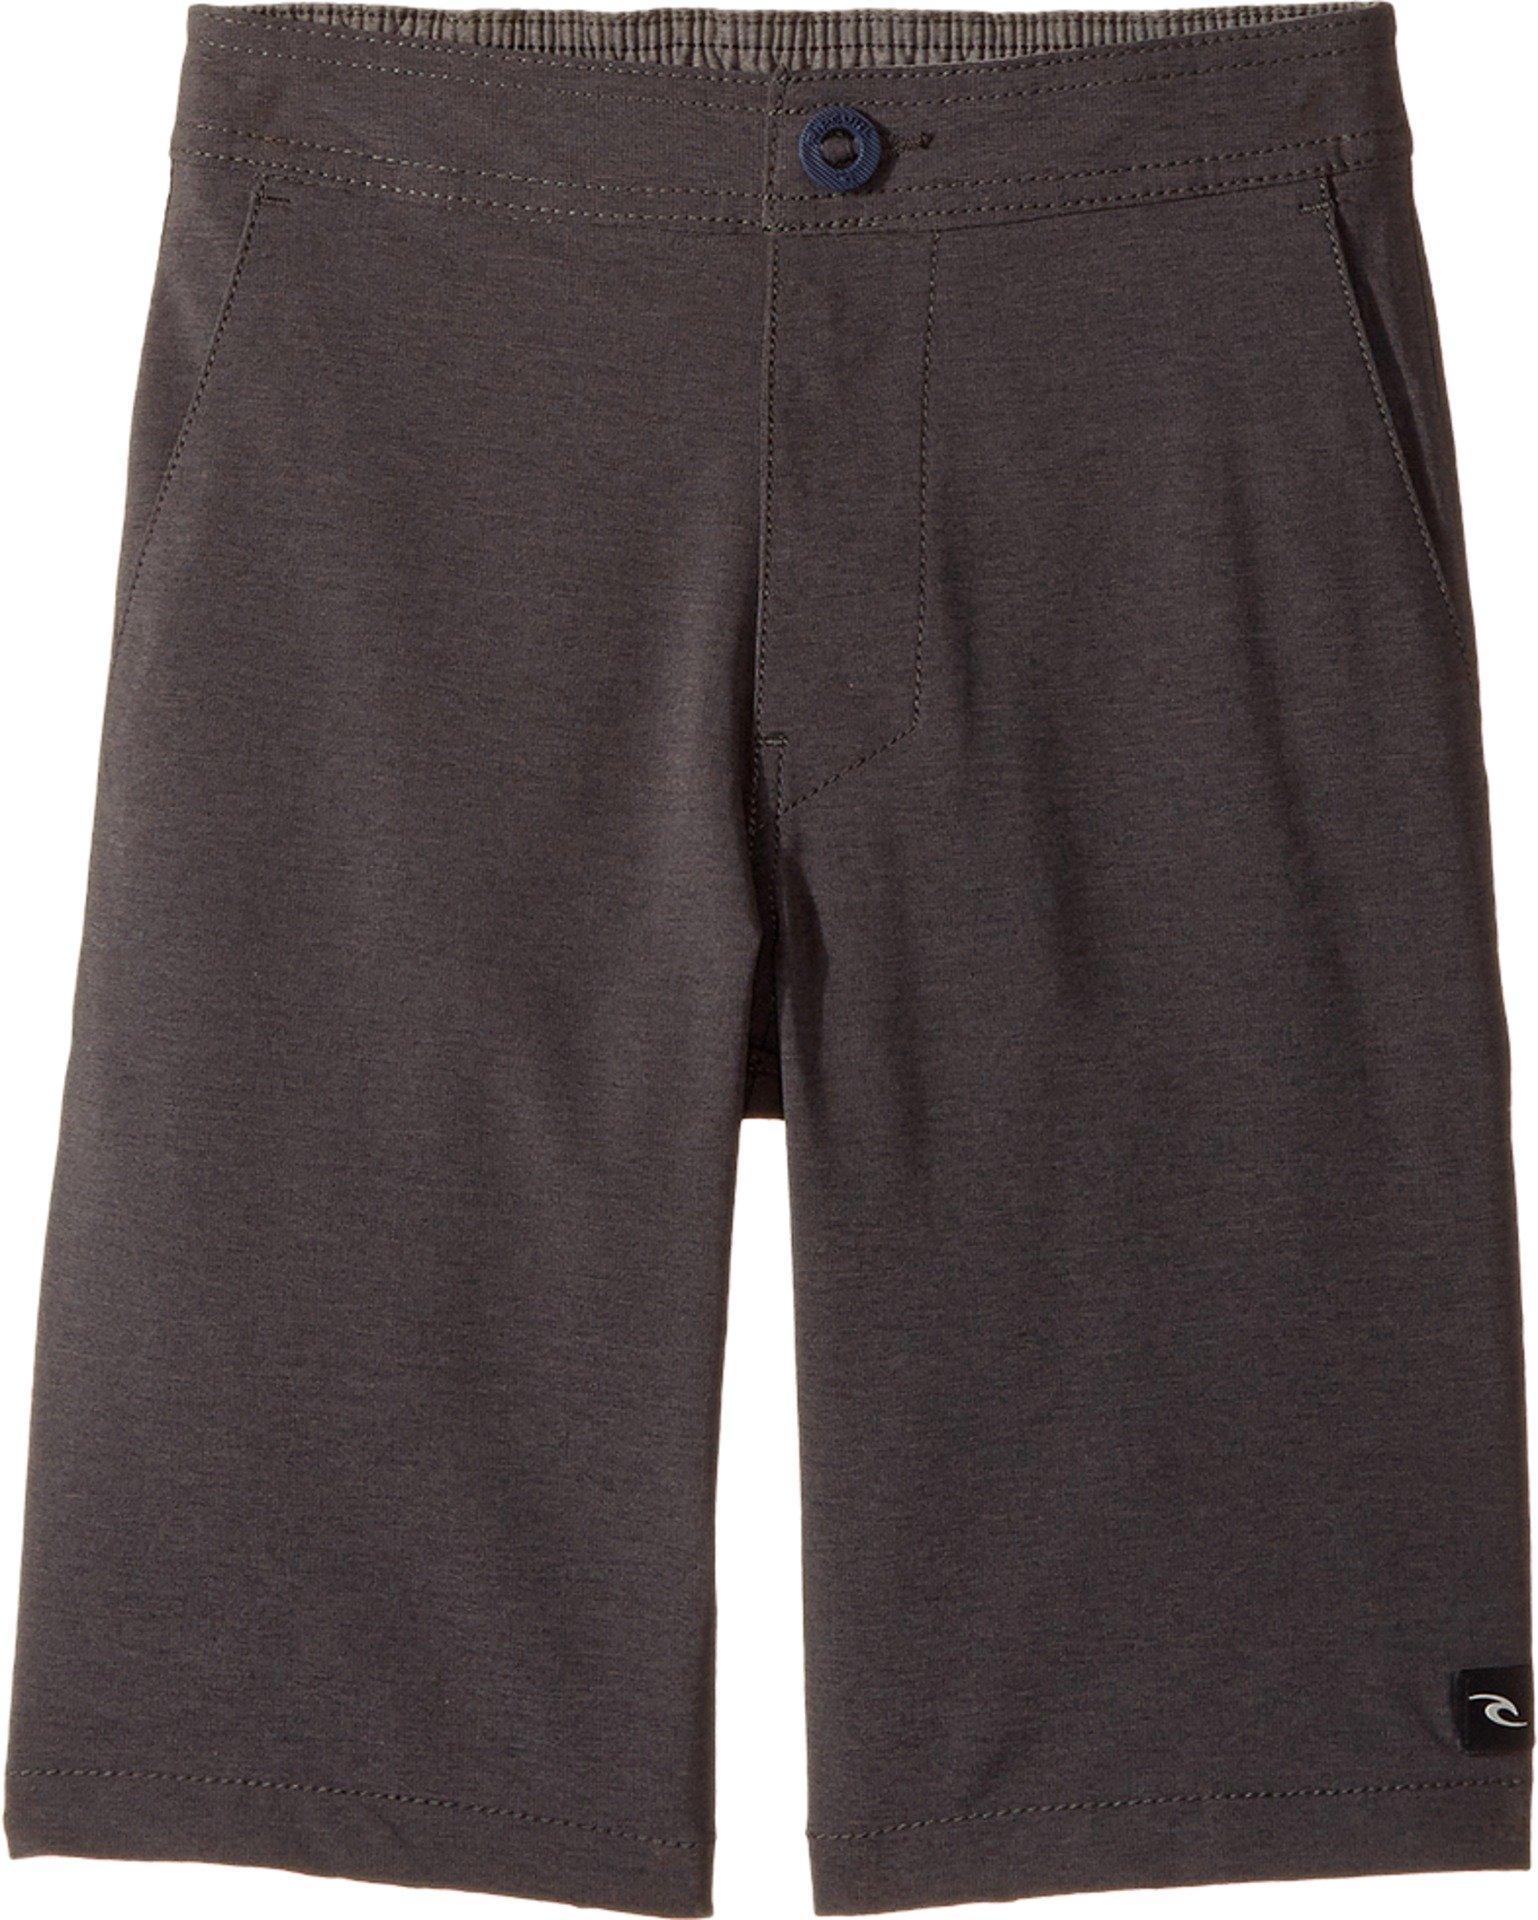 Rip Curl Kids Boy's Omaha Walkshorts (Big Kids) Black Medium